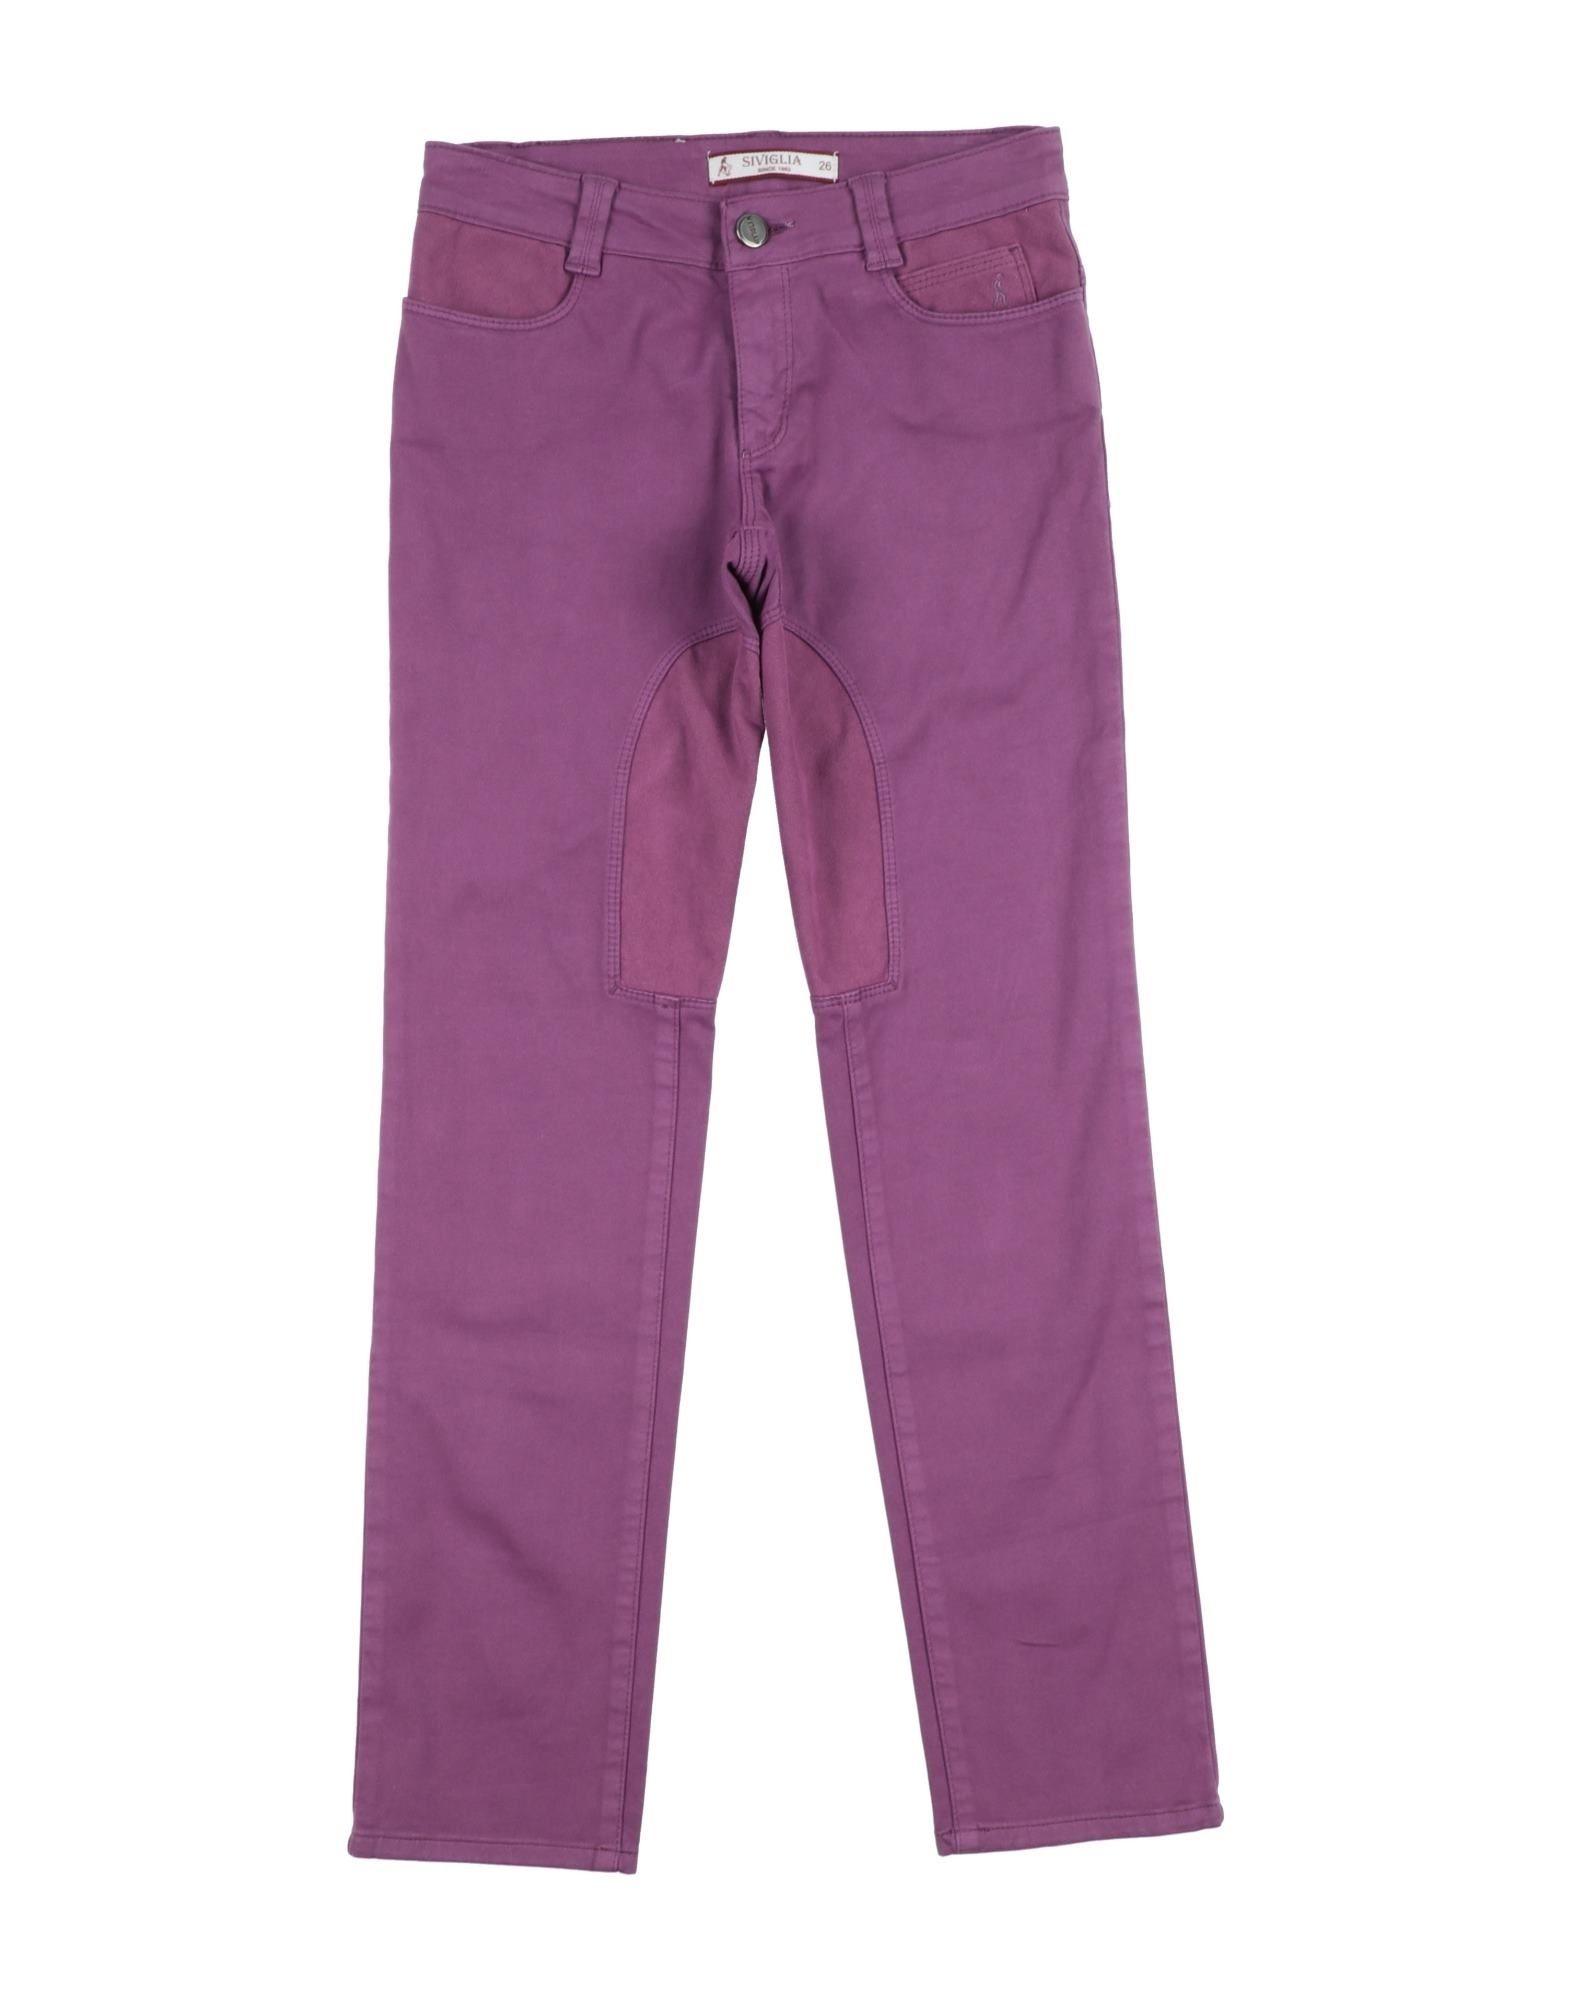 Siviglia Kids' Casual Pants In Purple